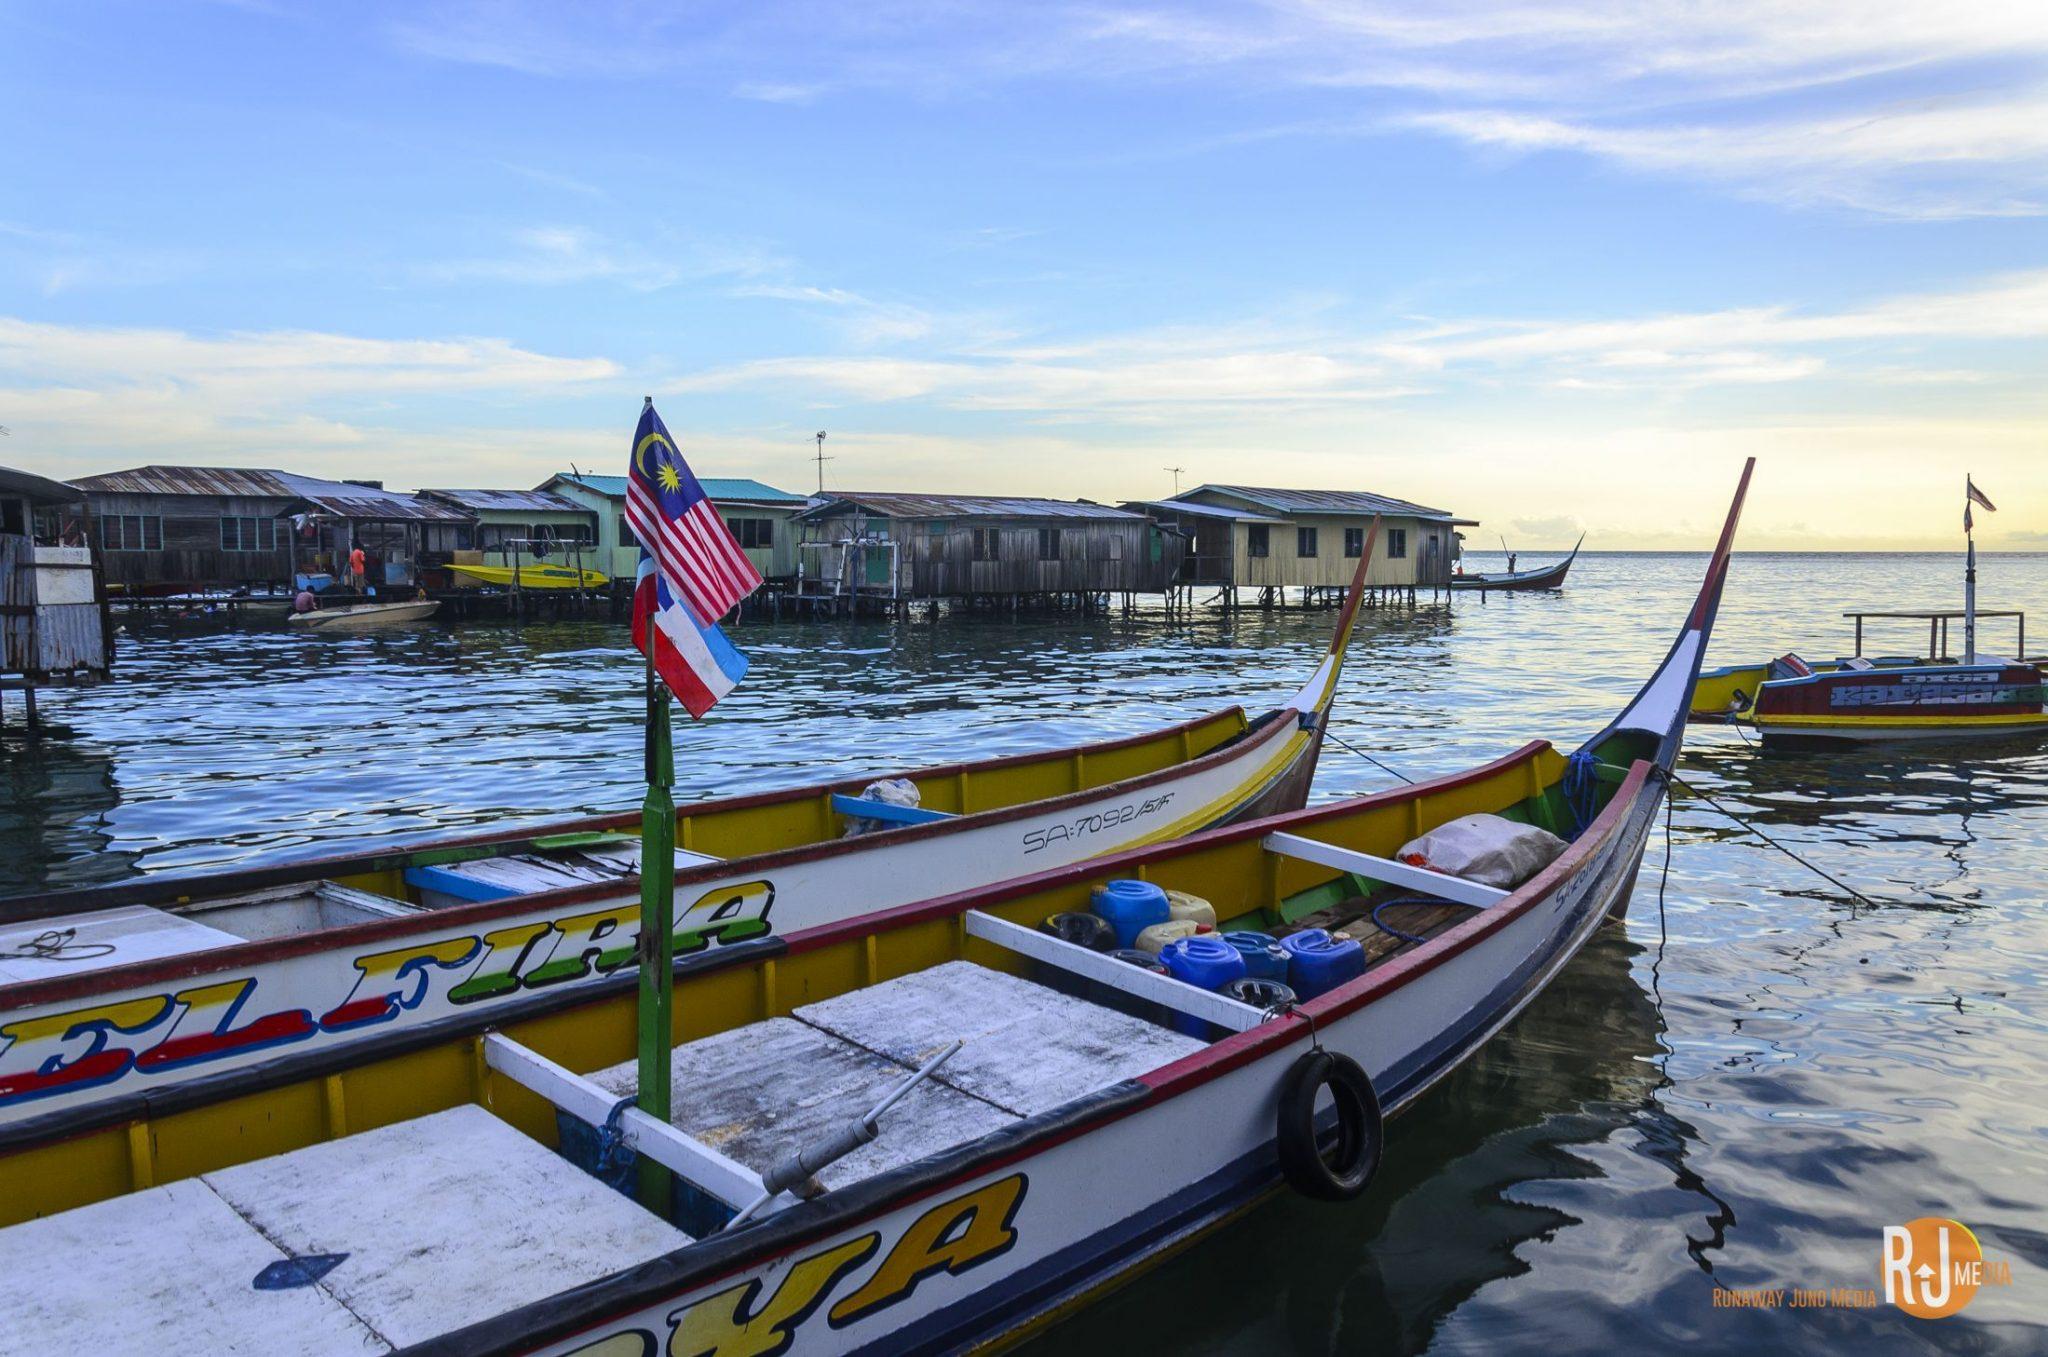 Stilt Village in Mabul Island, Borneo